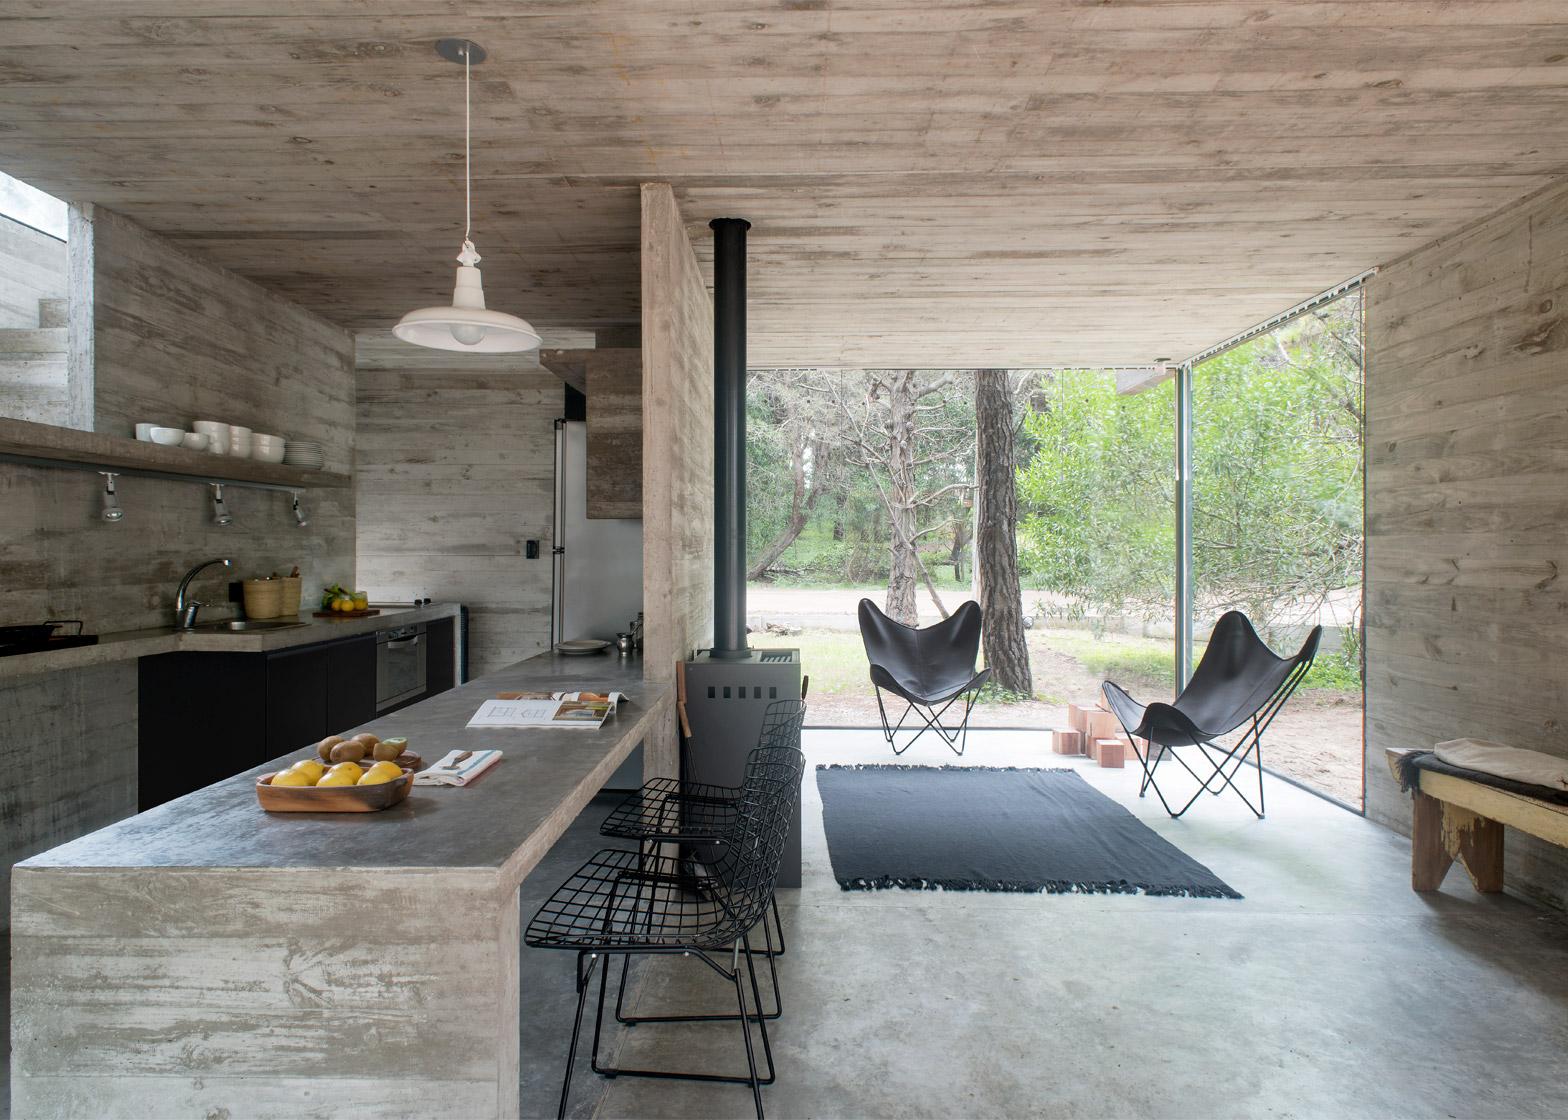 Casa 3 by Luciano Kruk